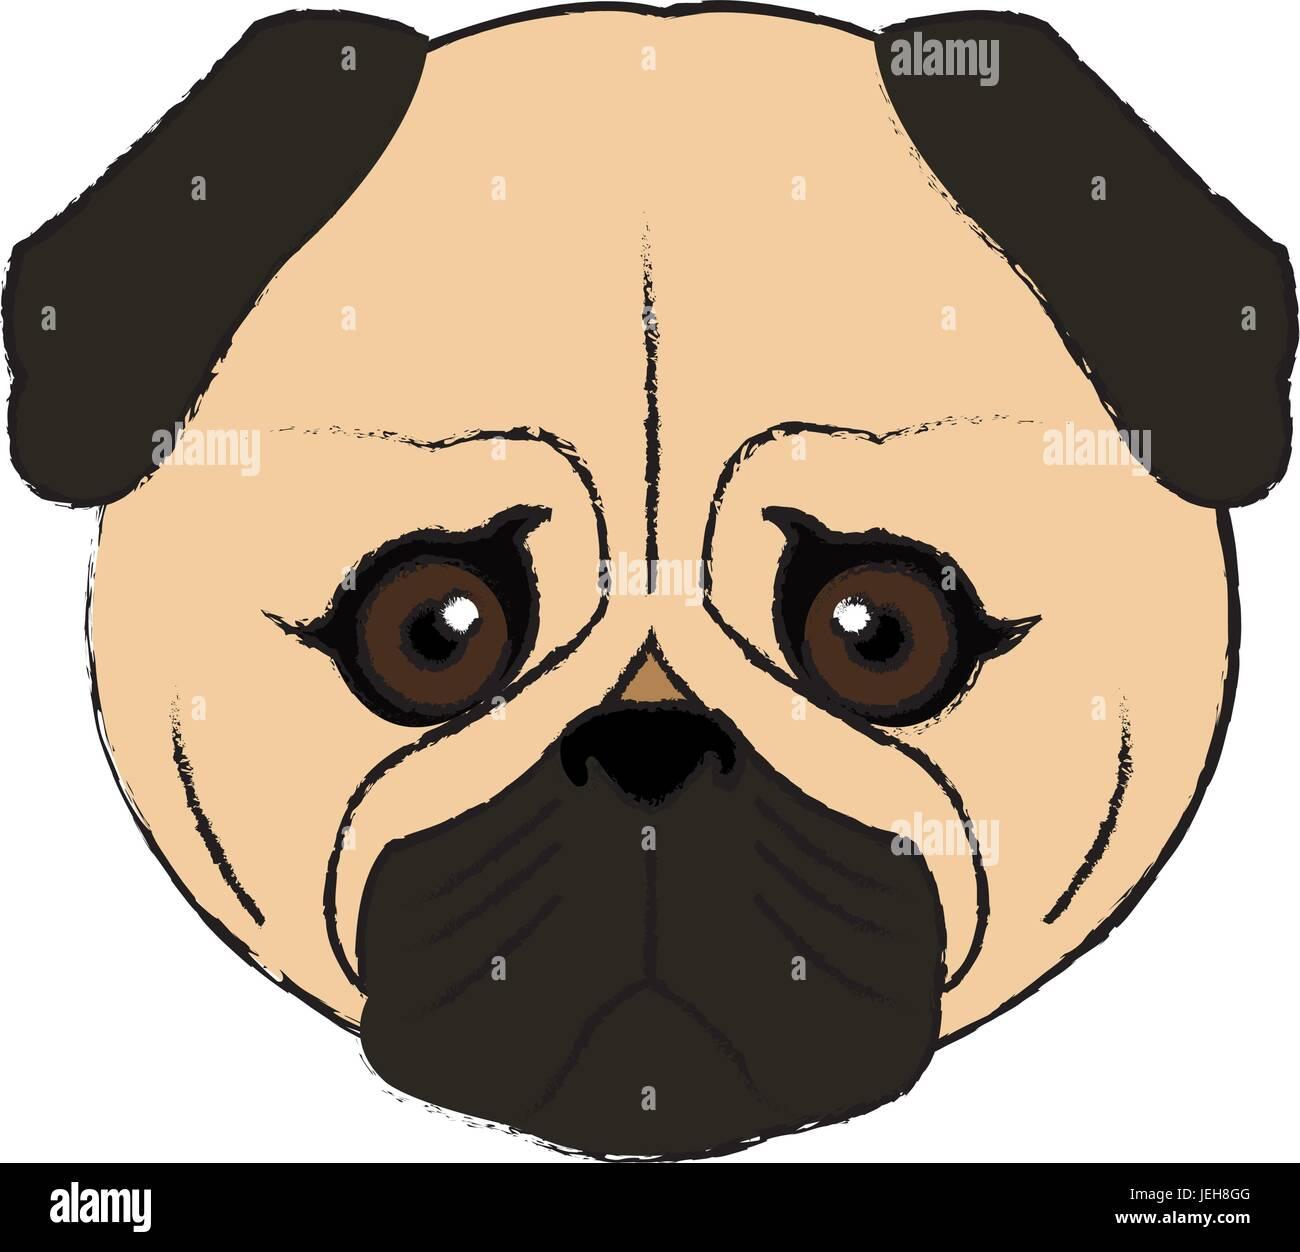 cute face dog pug pet aminal image Stock Vector